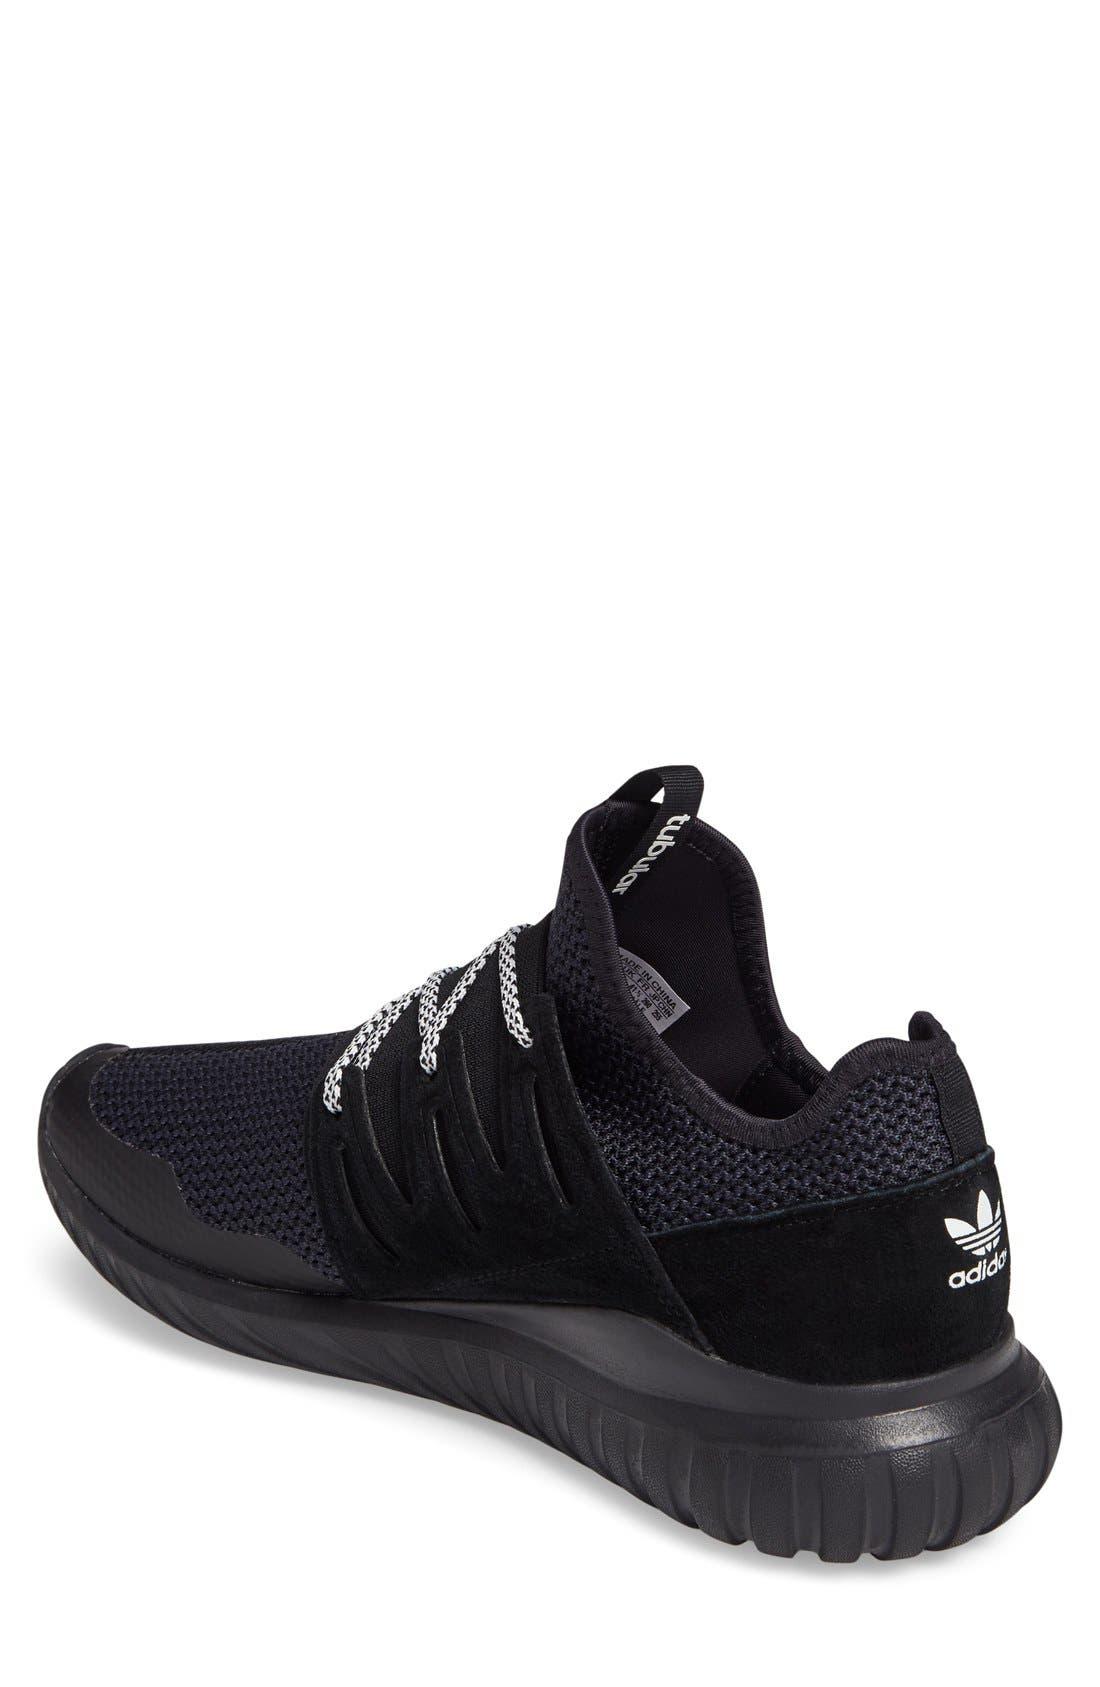 Alternate Image 2  - adidas 'Tubular Radial' Sneaker (Men)